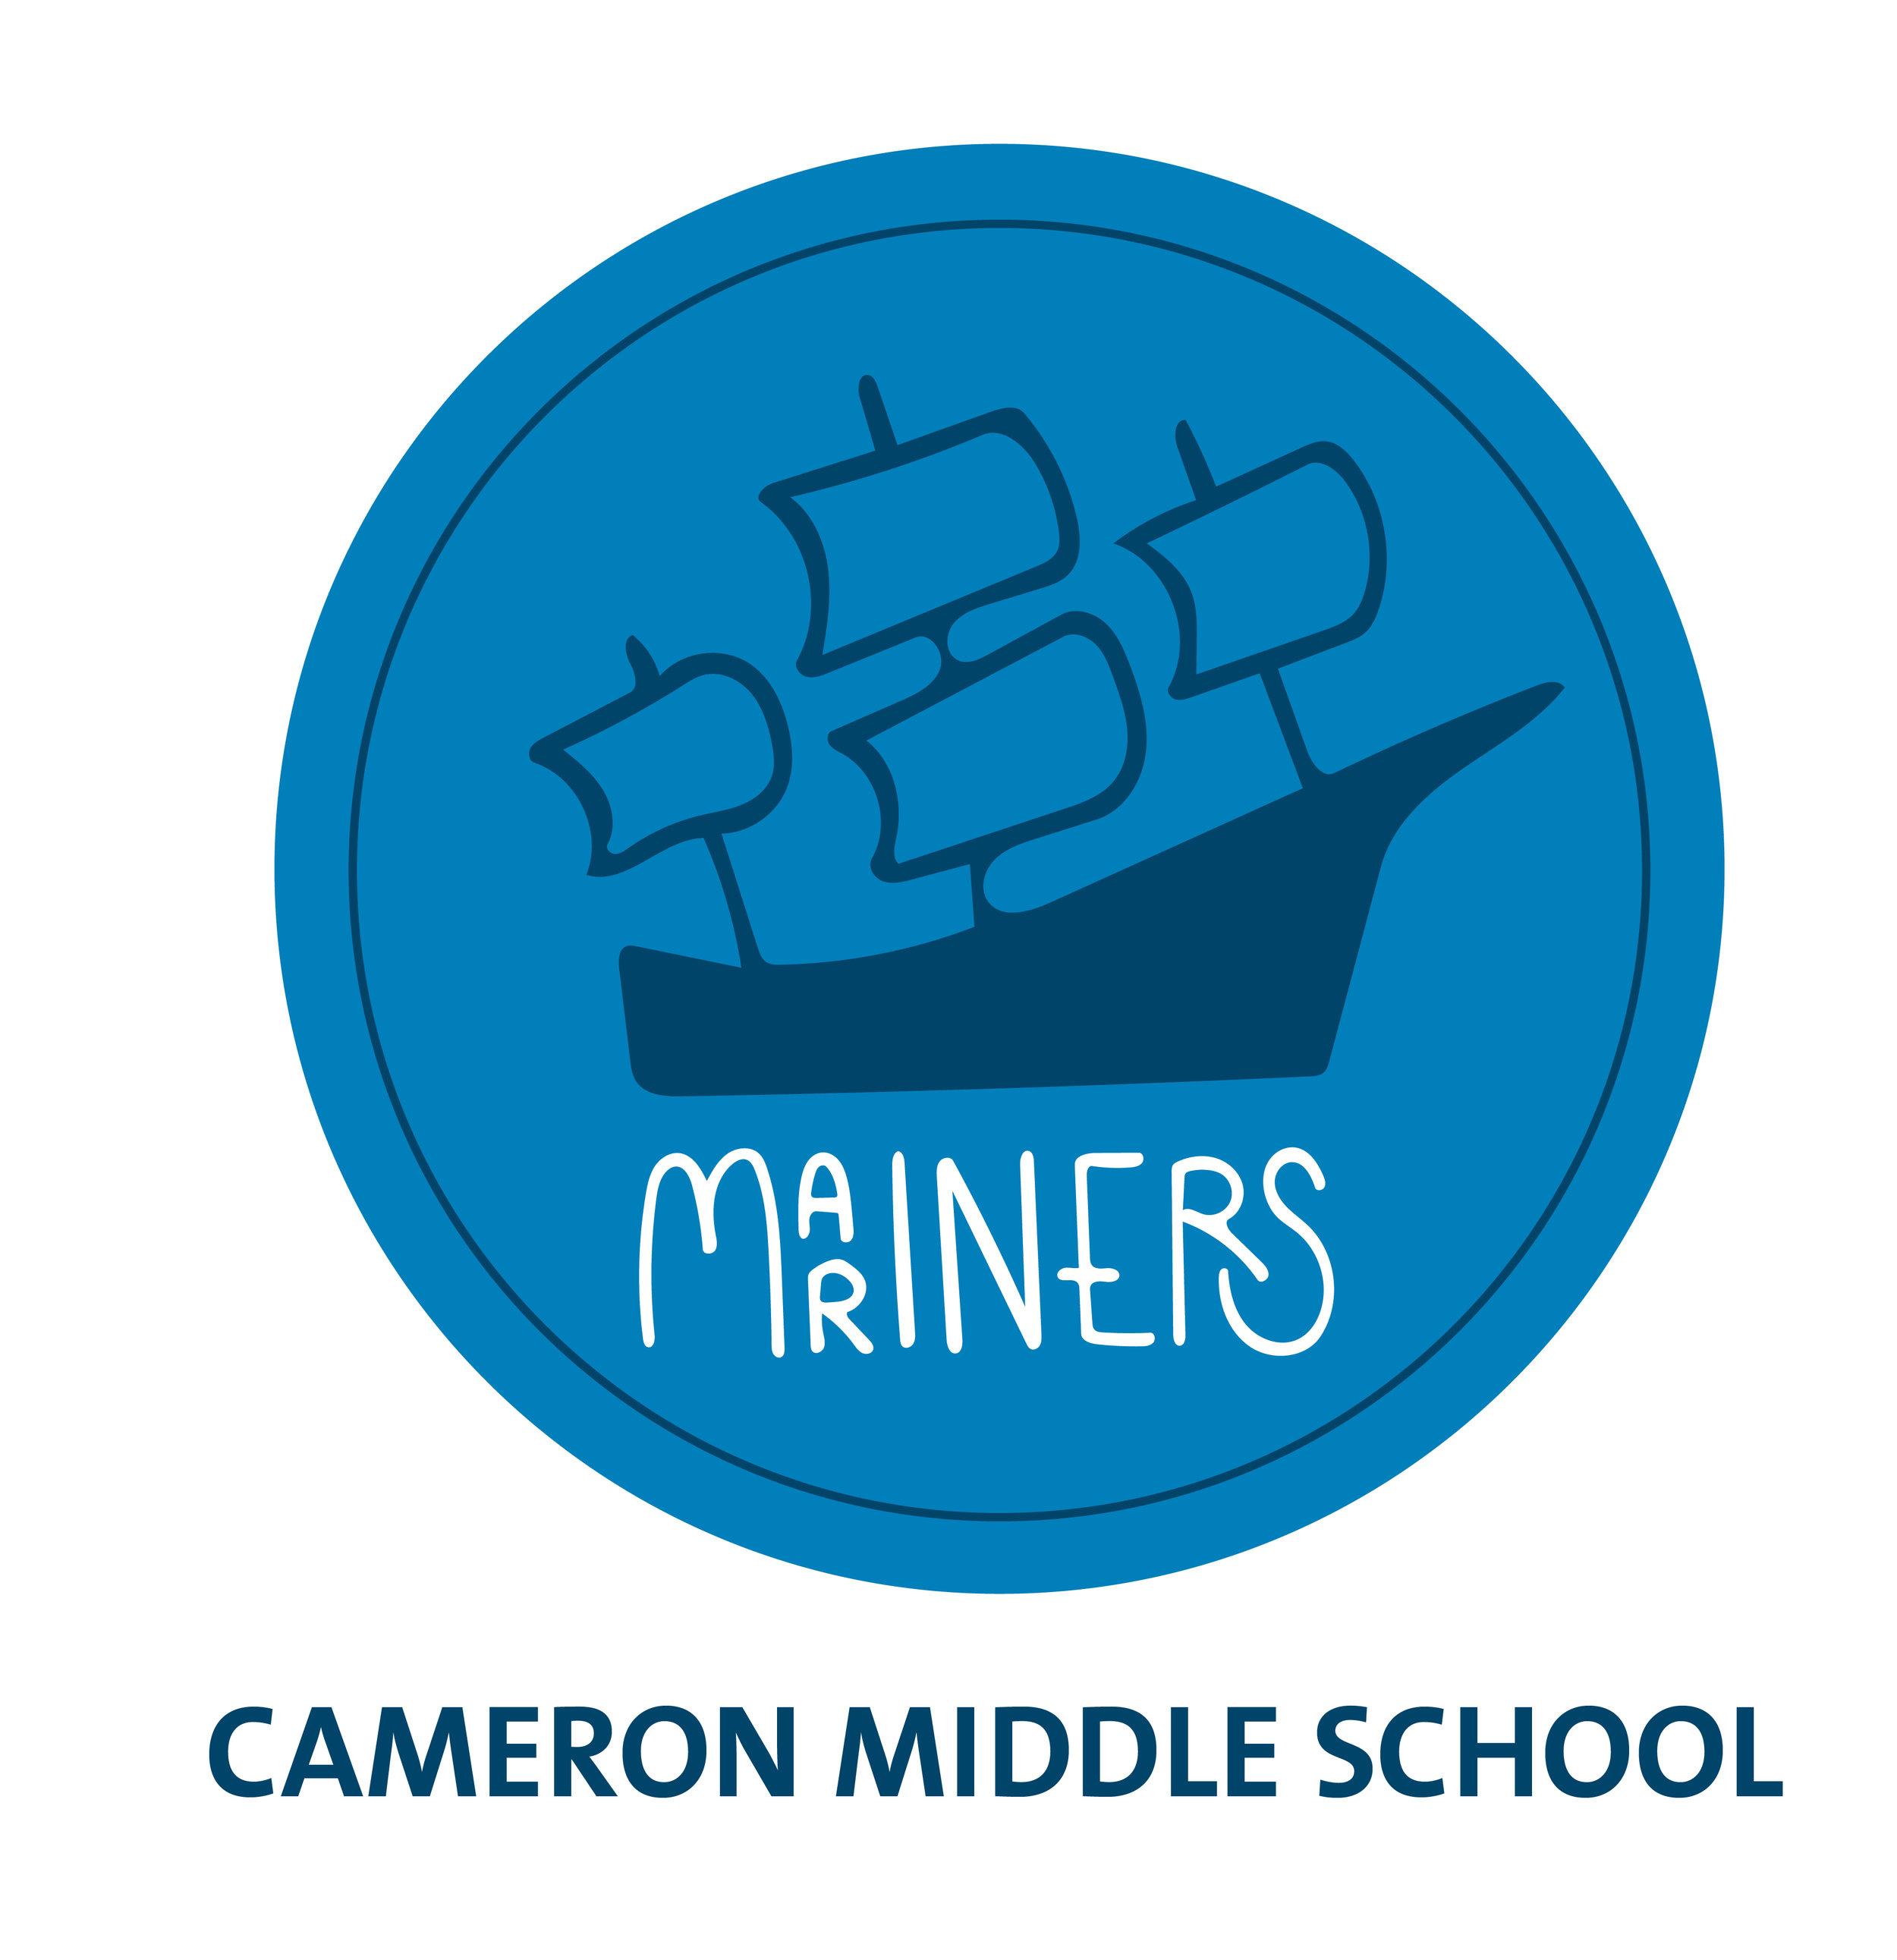 Middle School Logos-62.jpg